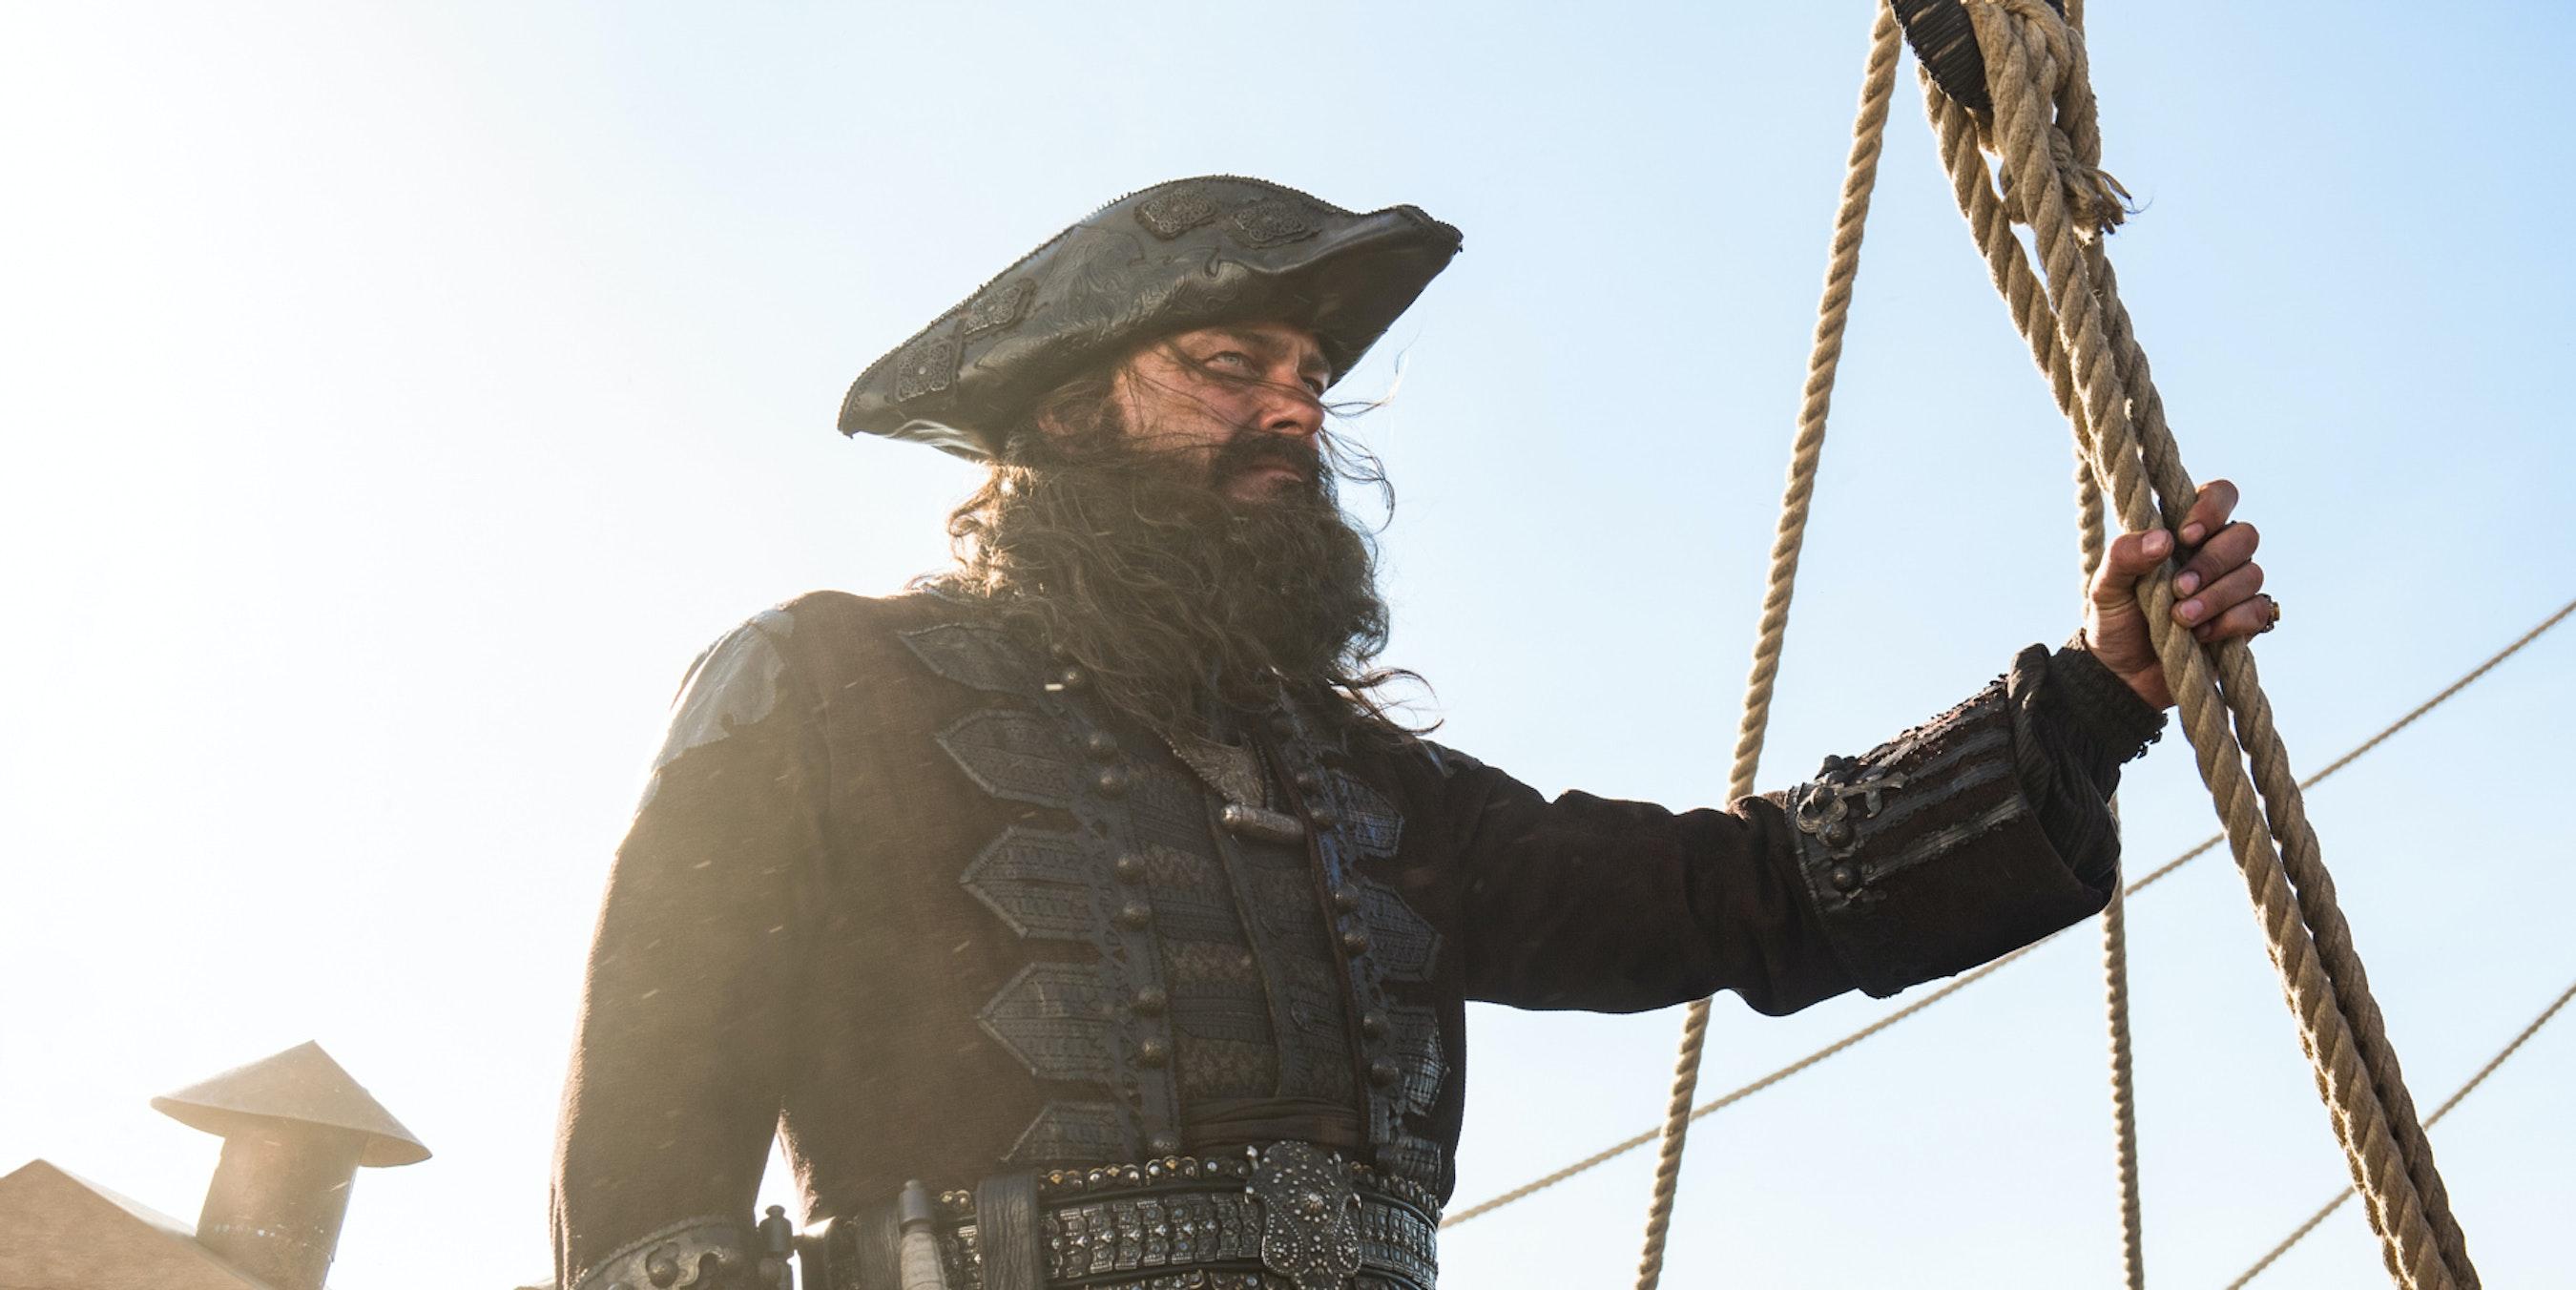 Ray Stevenson as Blackbeard on 'Black Sails' Season 4